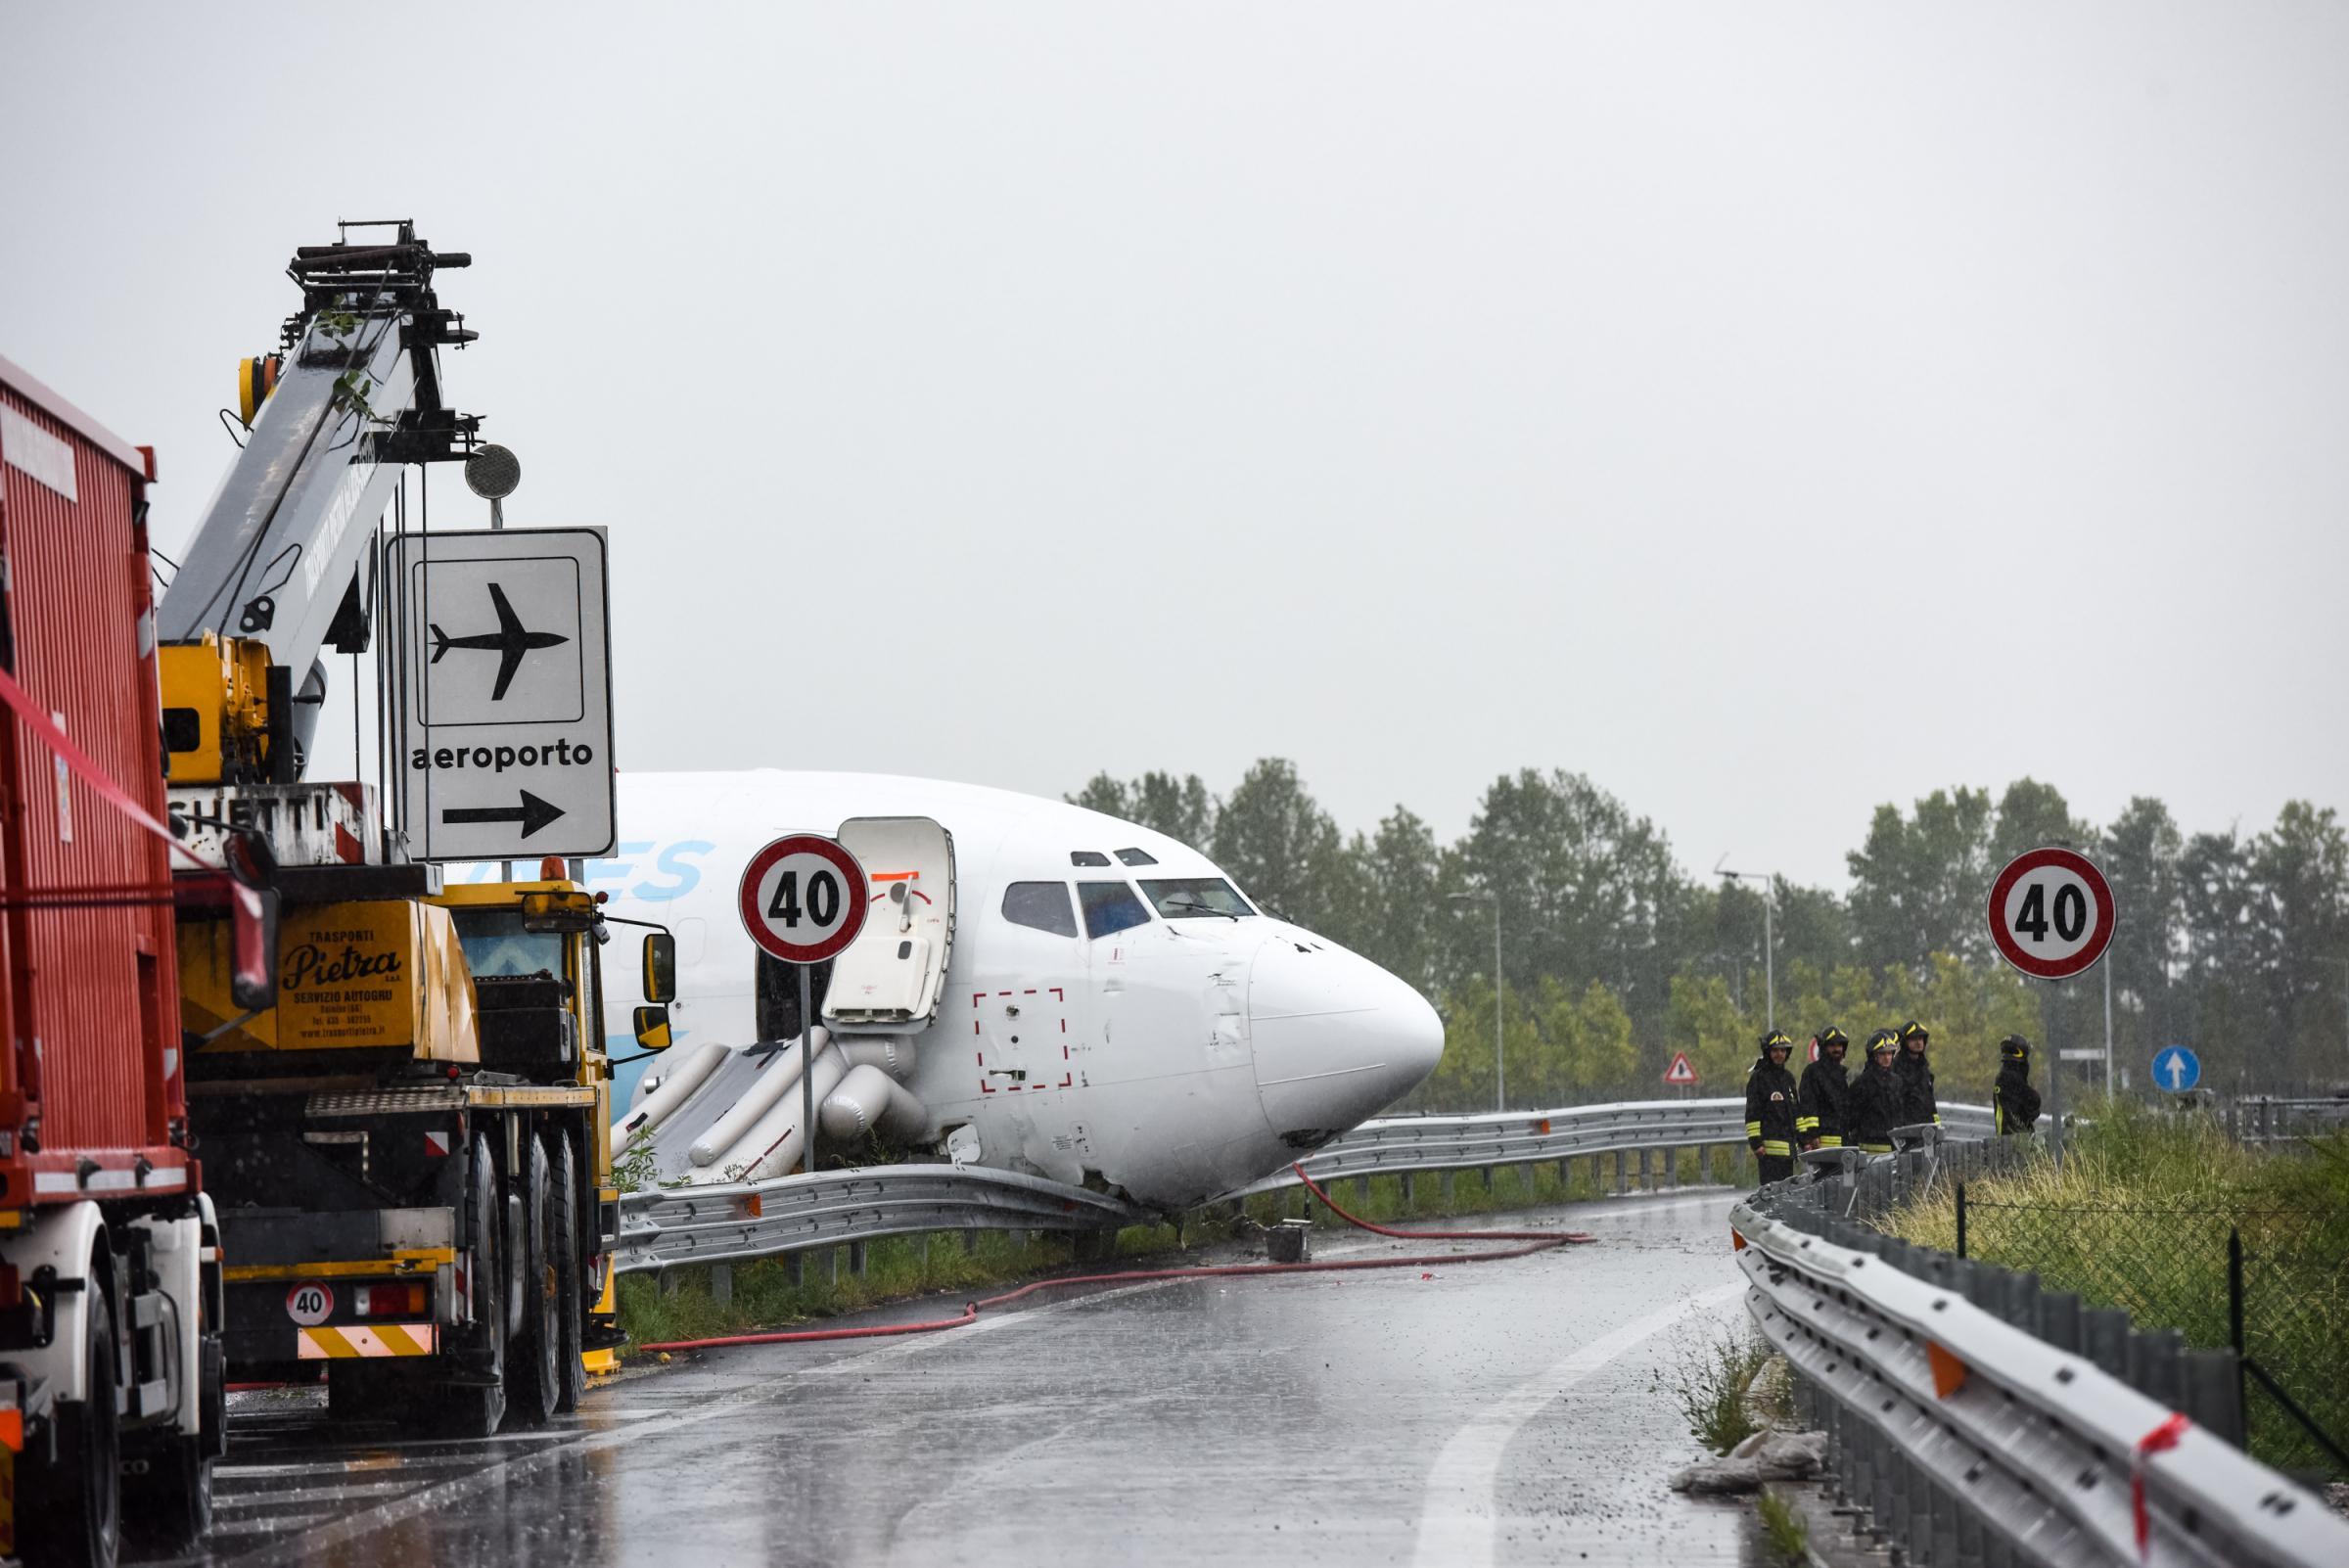 Aeroporto Orio Al Serio : Orio al serio stock photos orio al serio stock images alamy